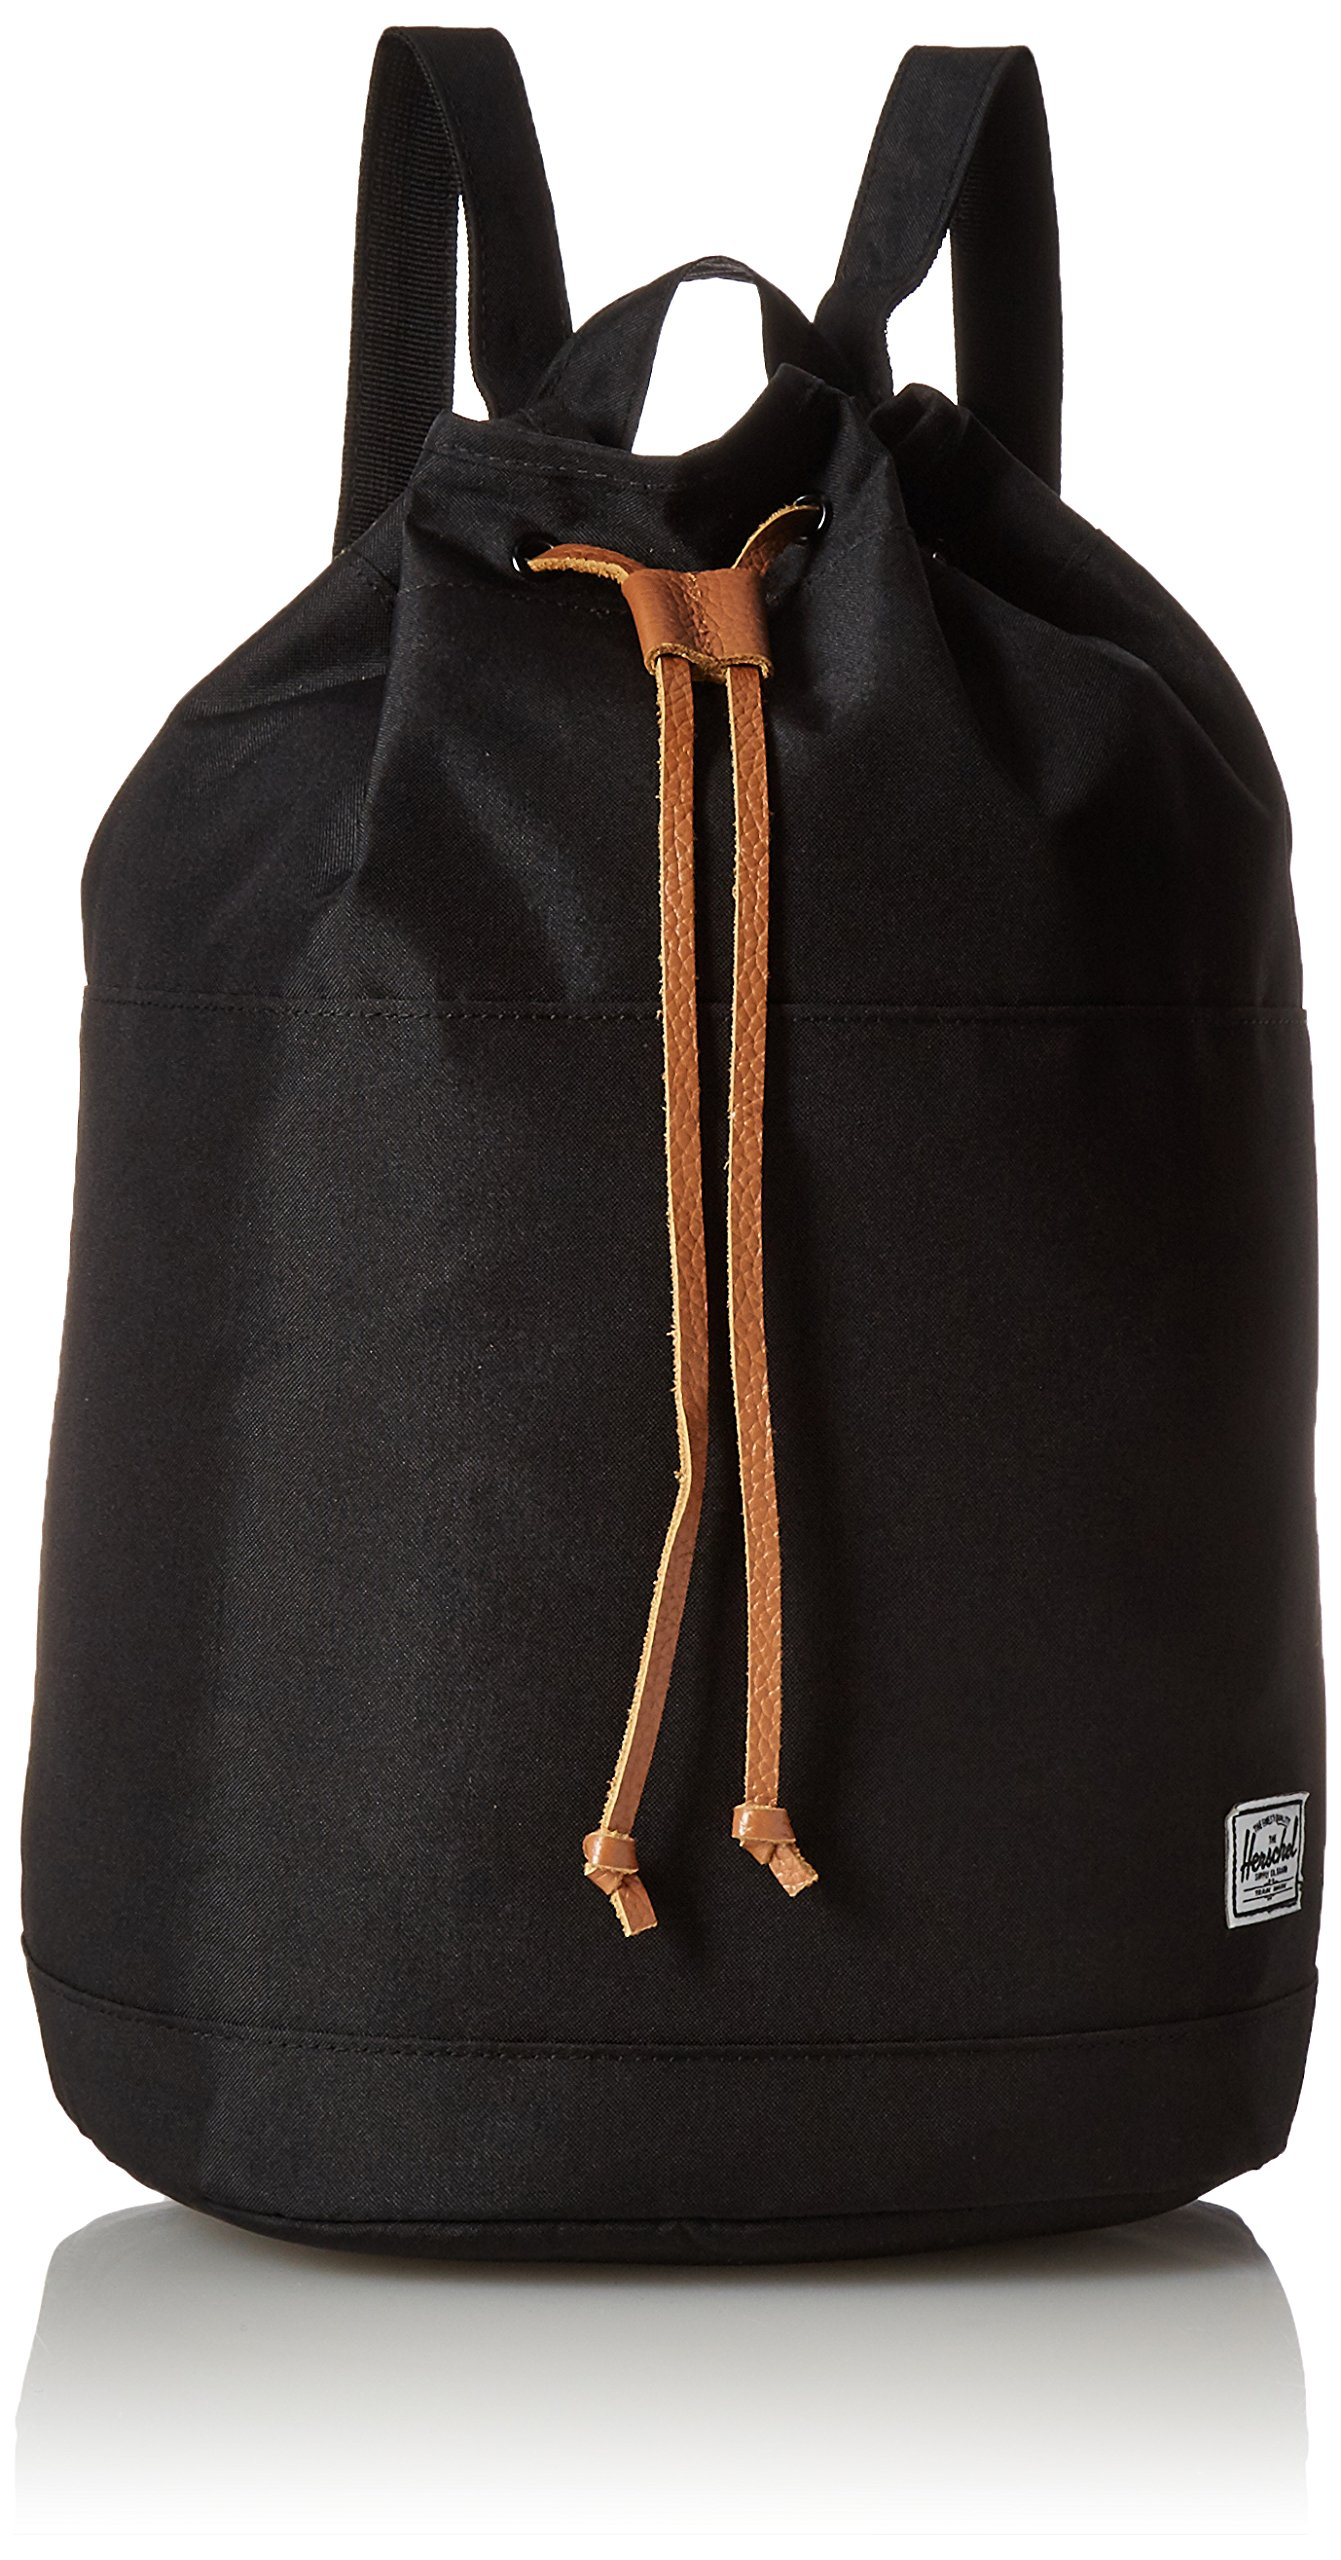 f0e8934acbd Backpacks - Herschel Supply Co. Hanson Women s Backpack Black was ...